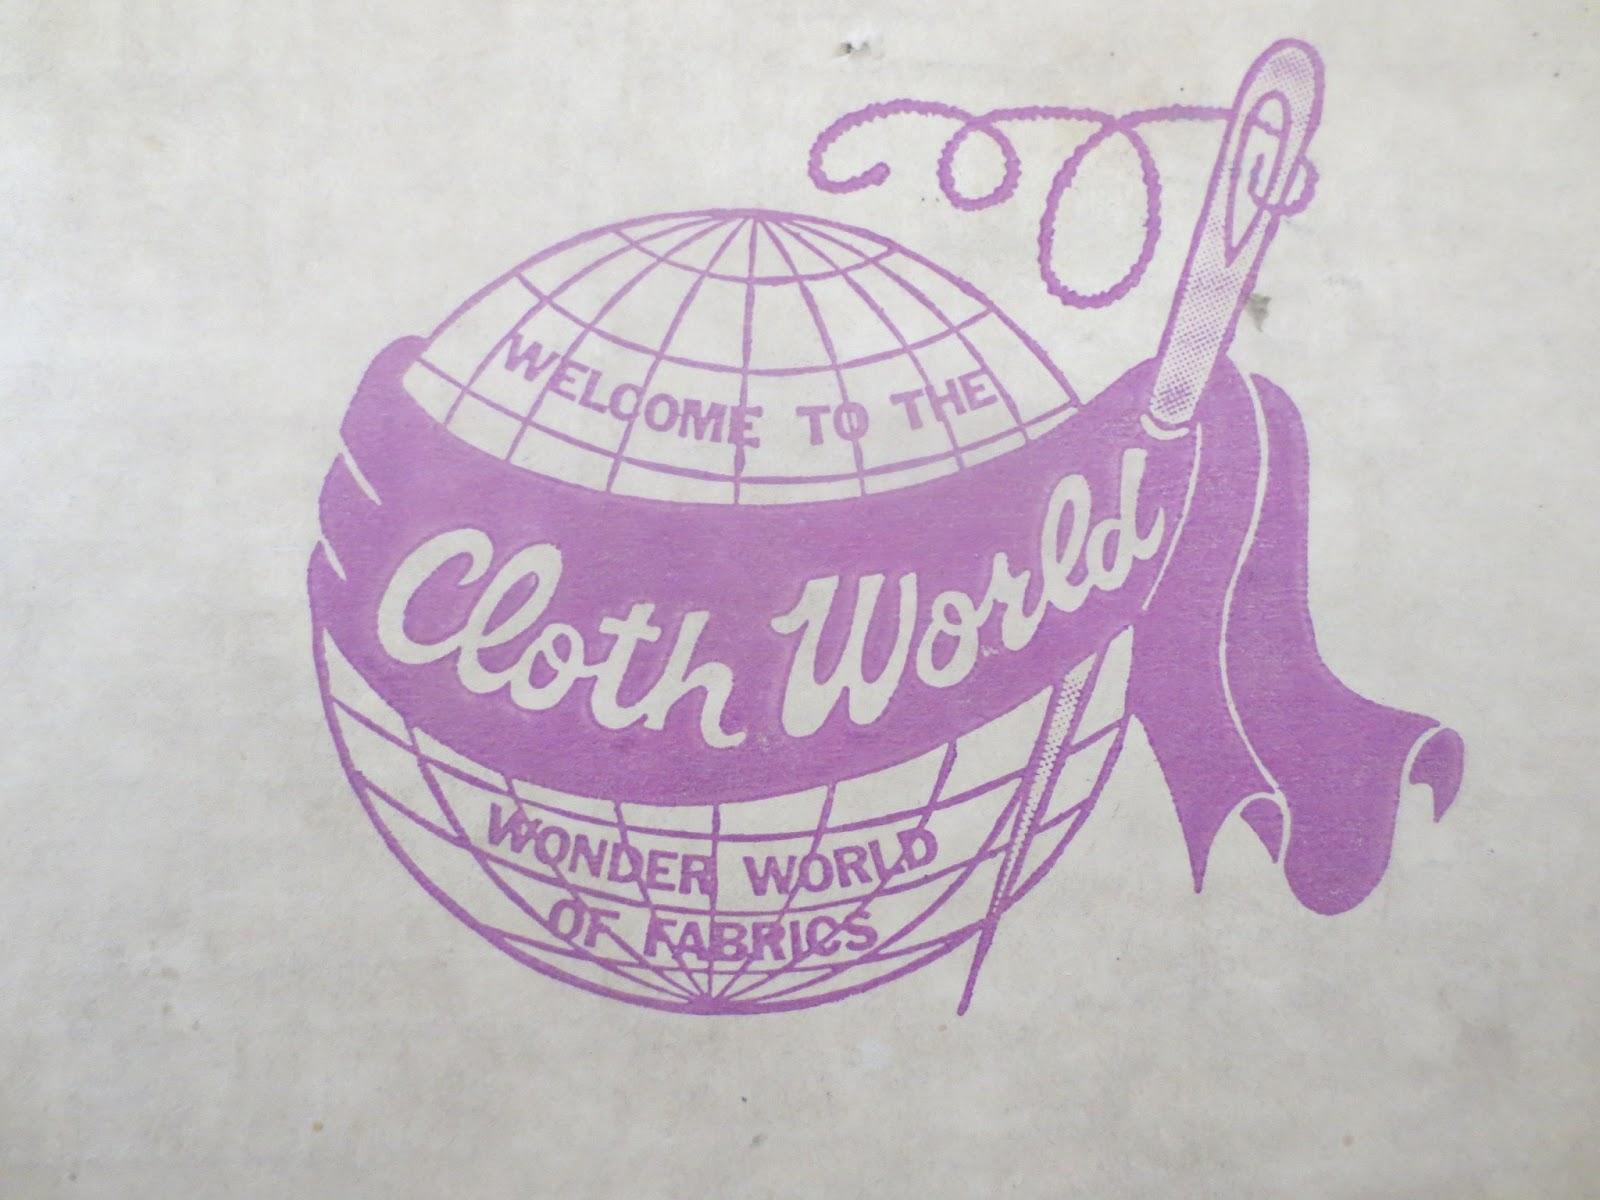 Cloth World Fabric Store Via Brentwoodlane